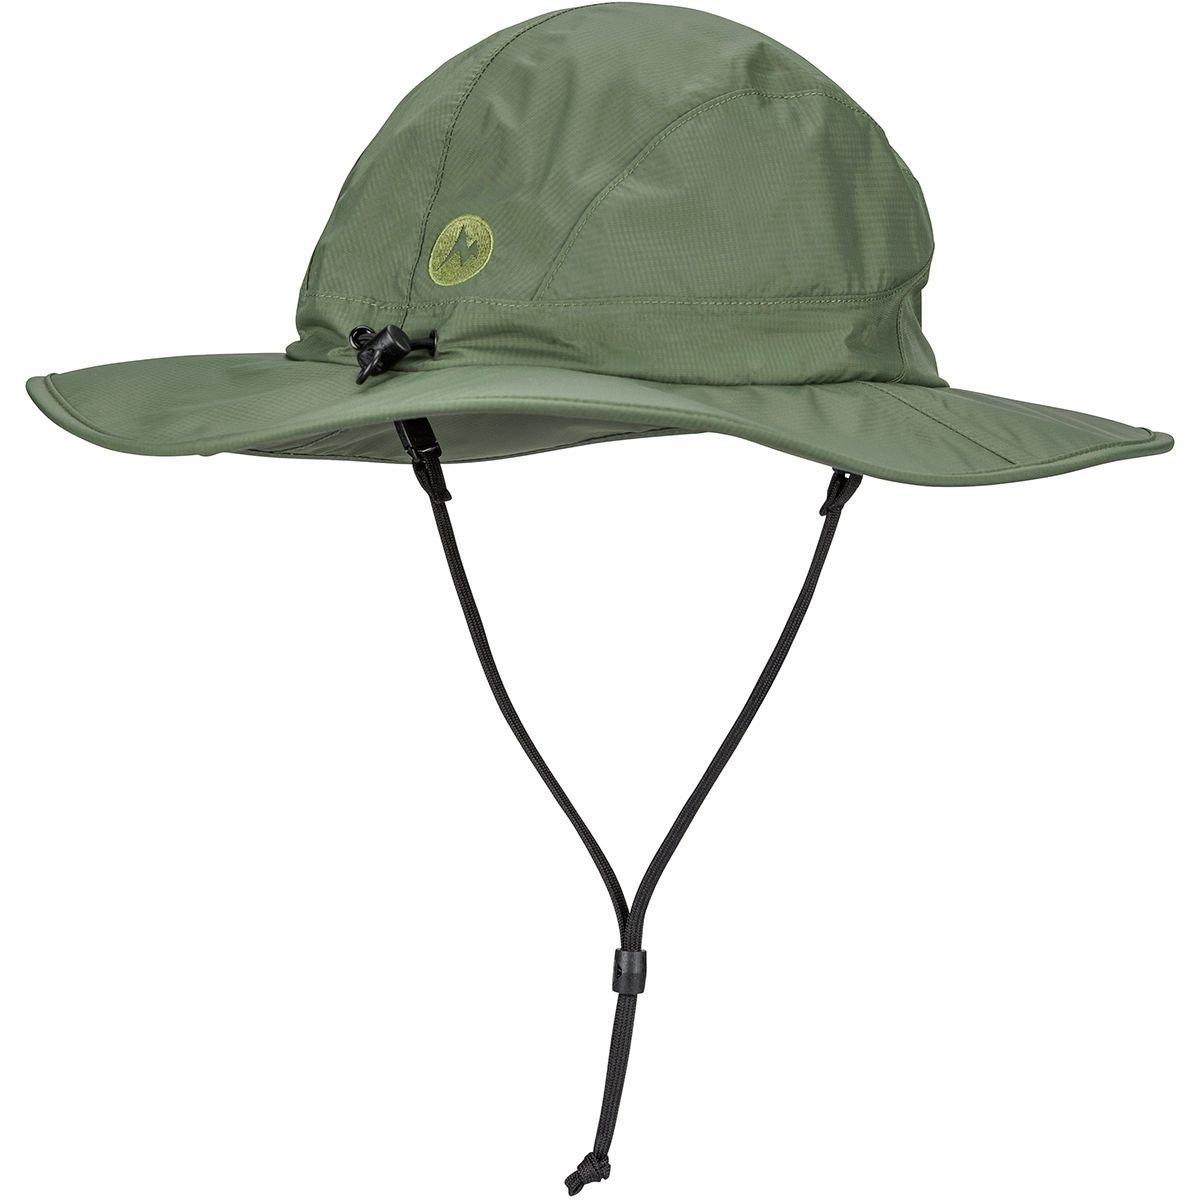 47baa738317 Get Quotations · Marmot PreCip Safari Hat